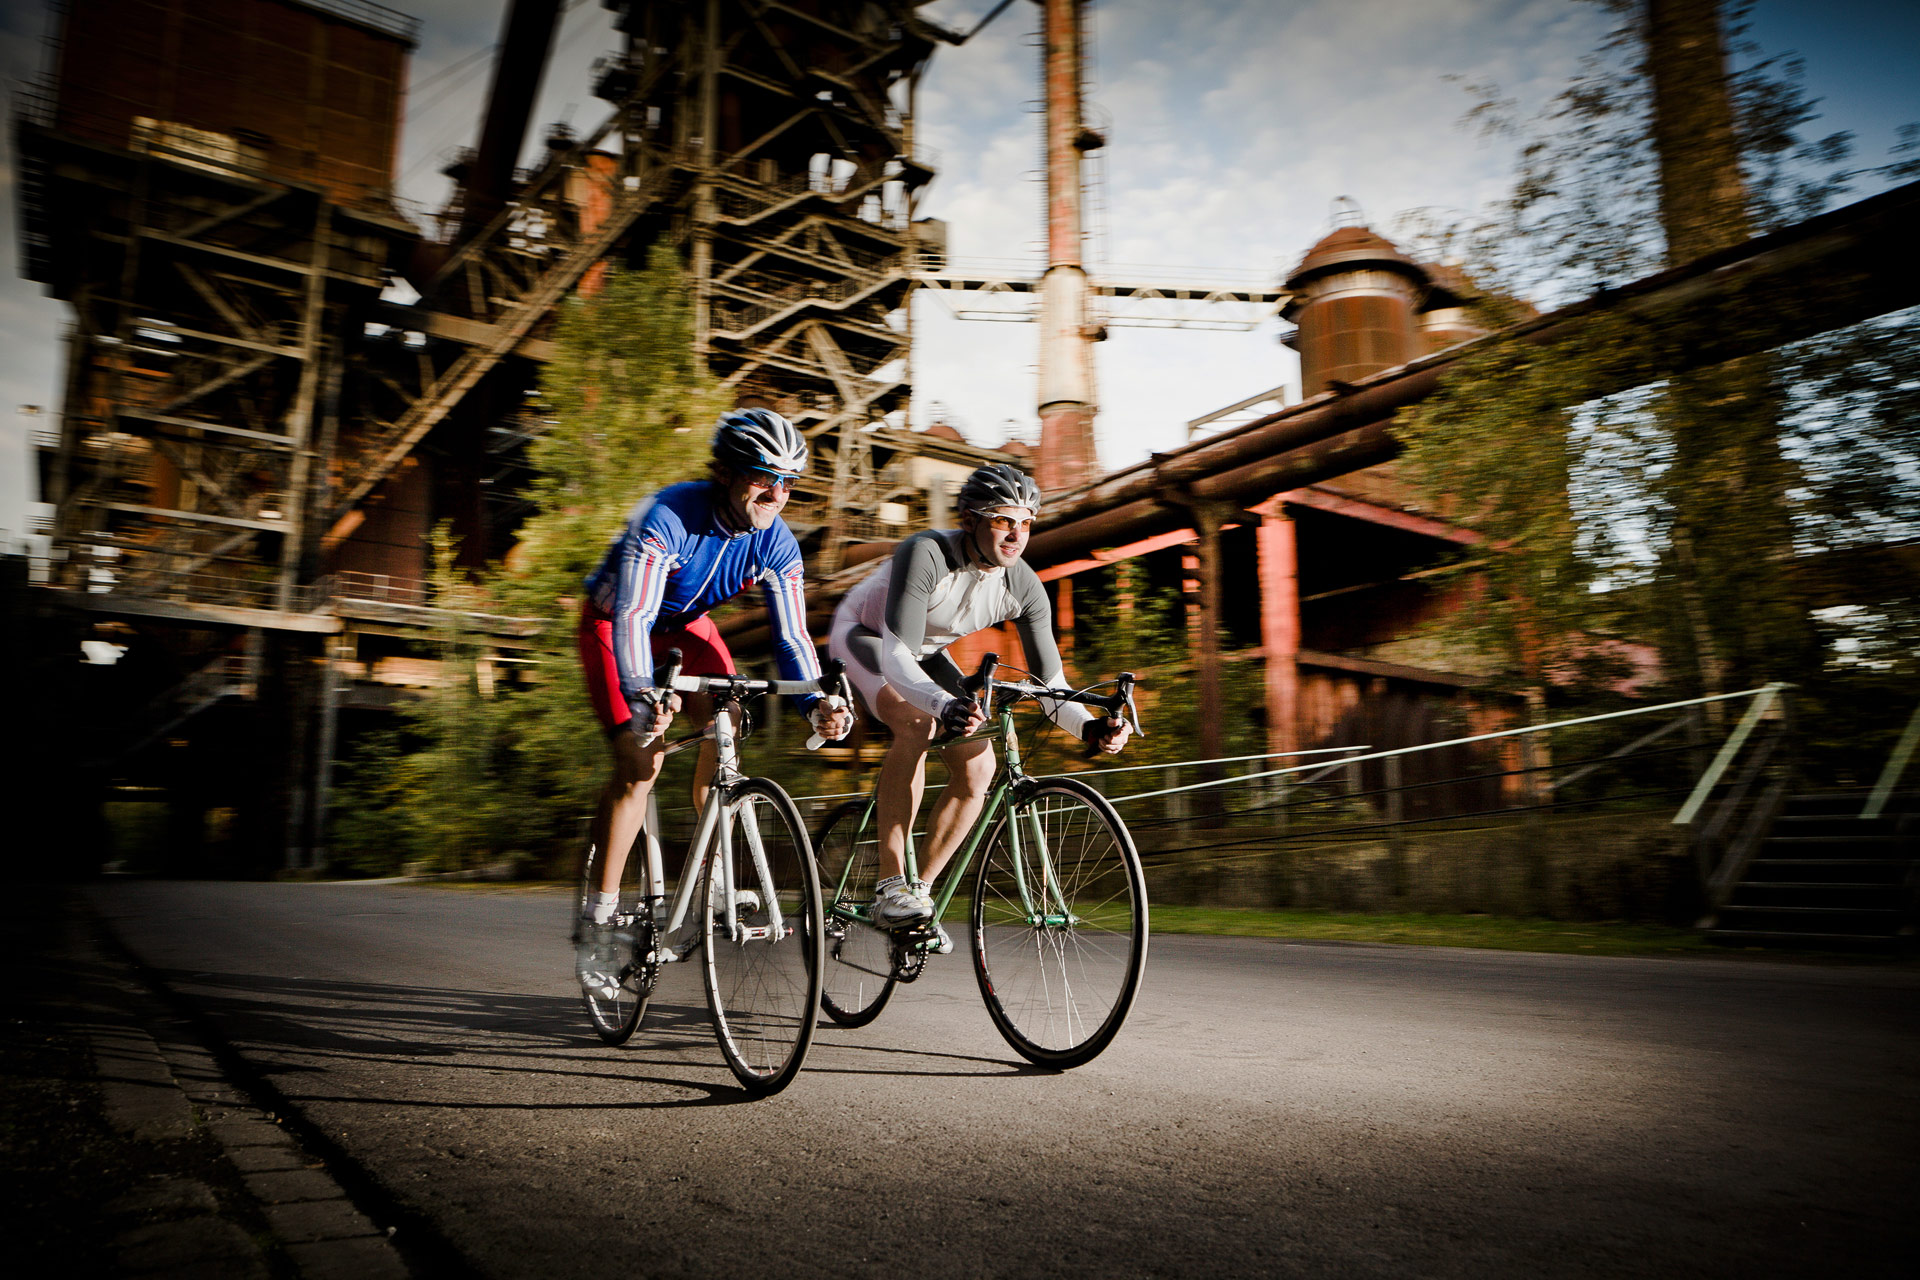 04-Roadbike-Magazin-Stahlrahmen-Duisburg